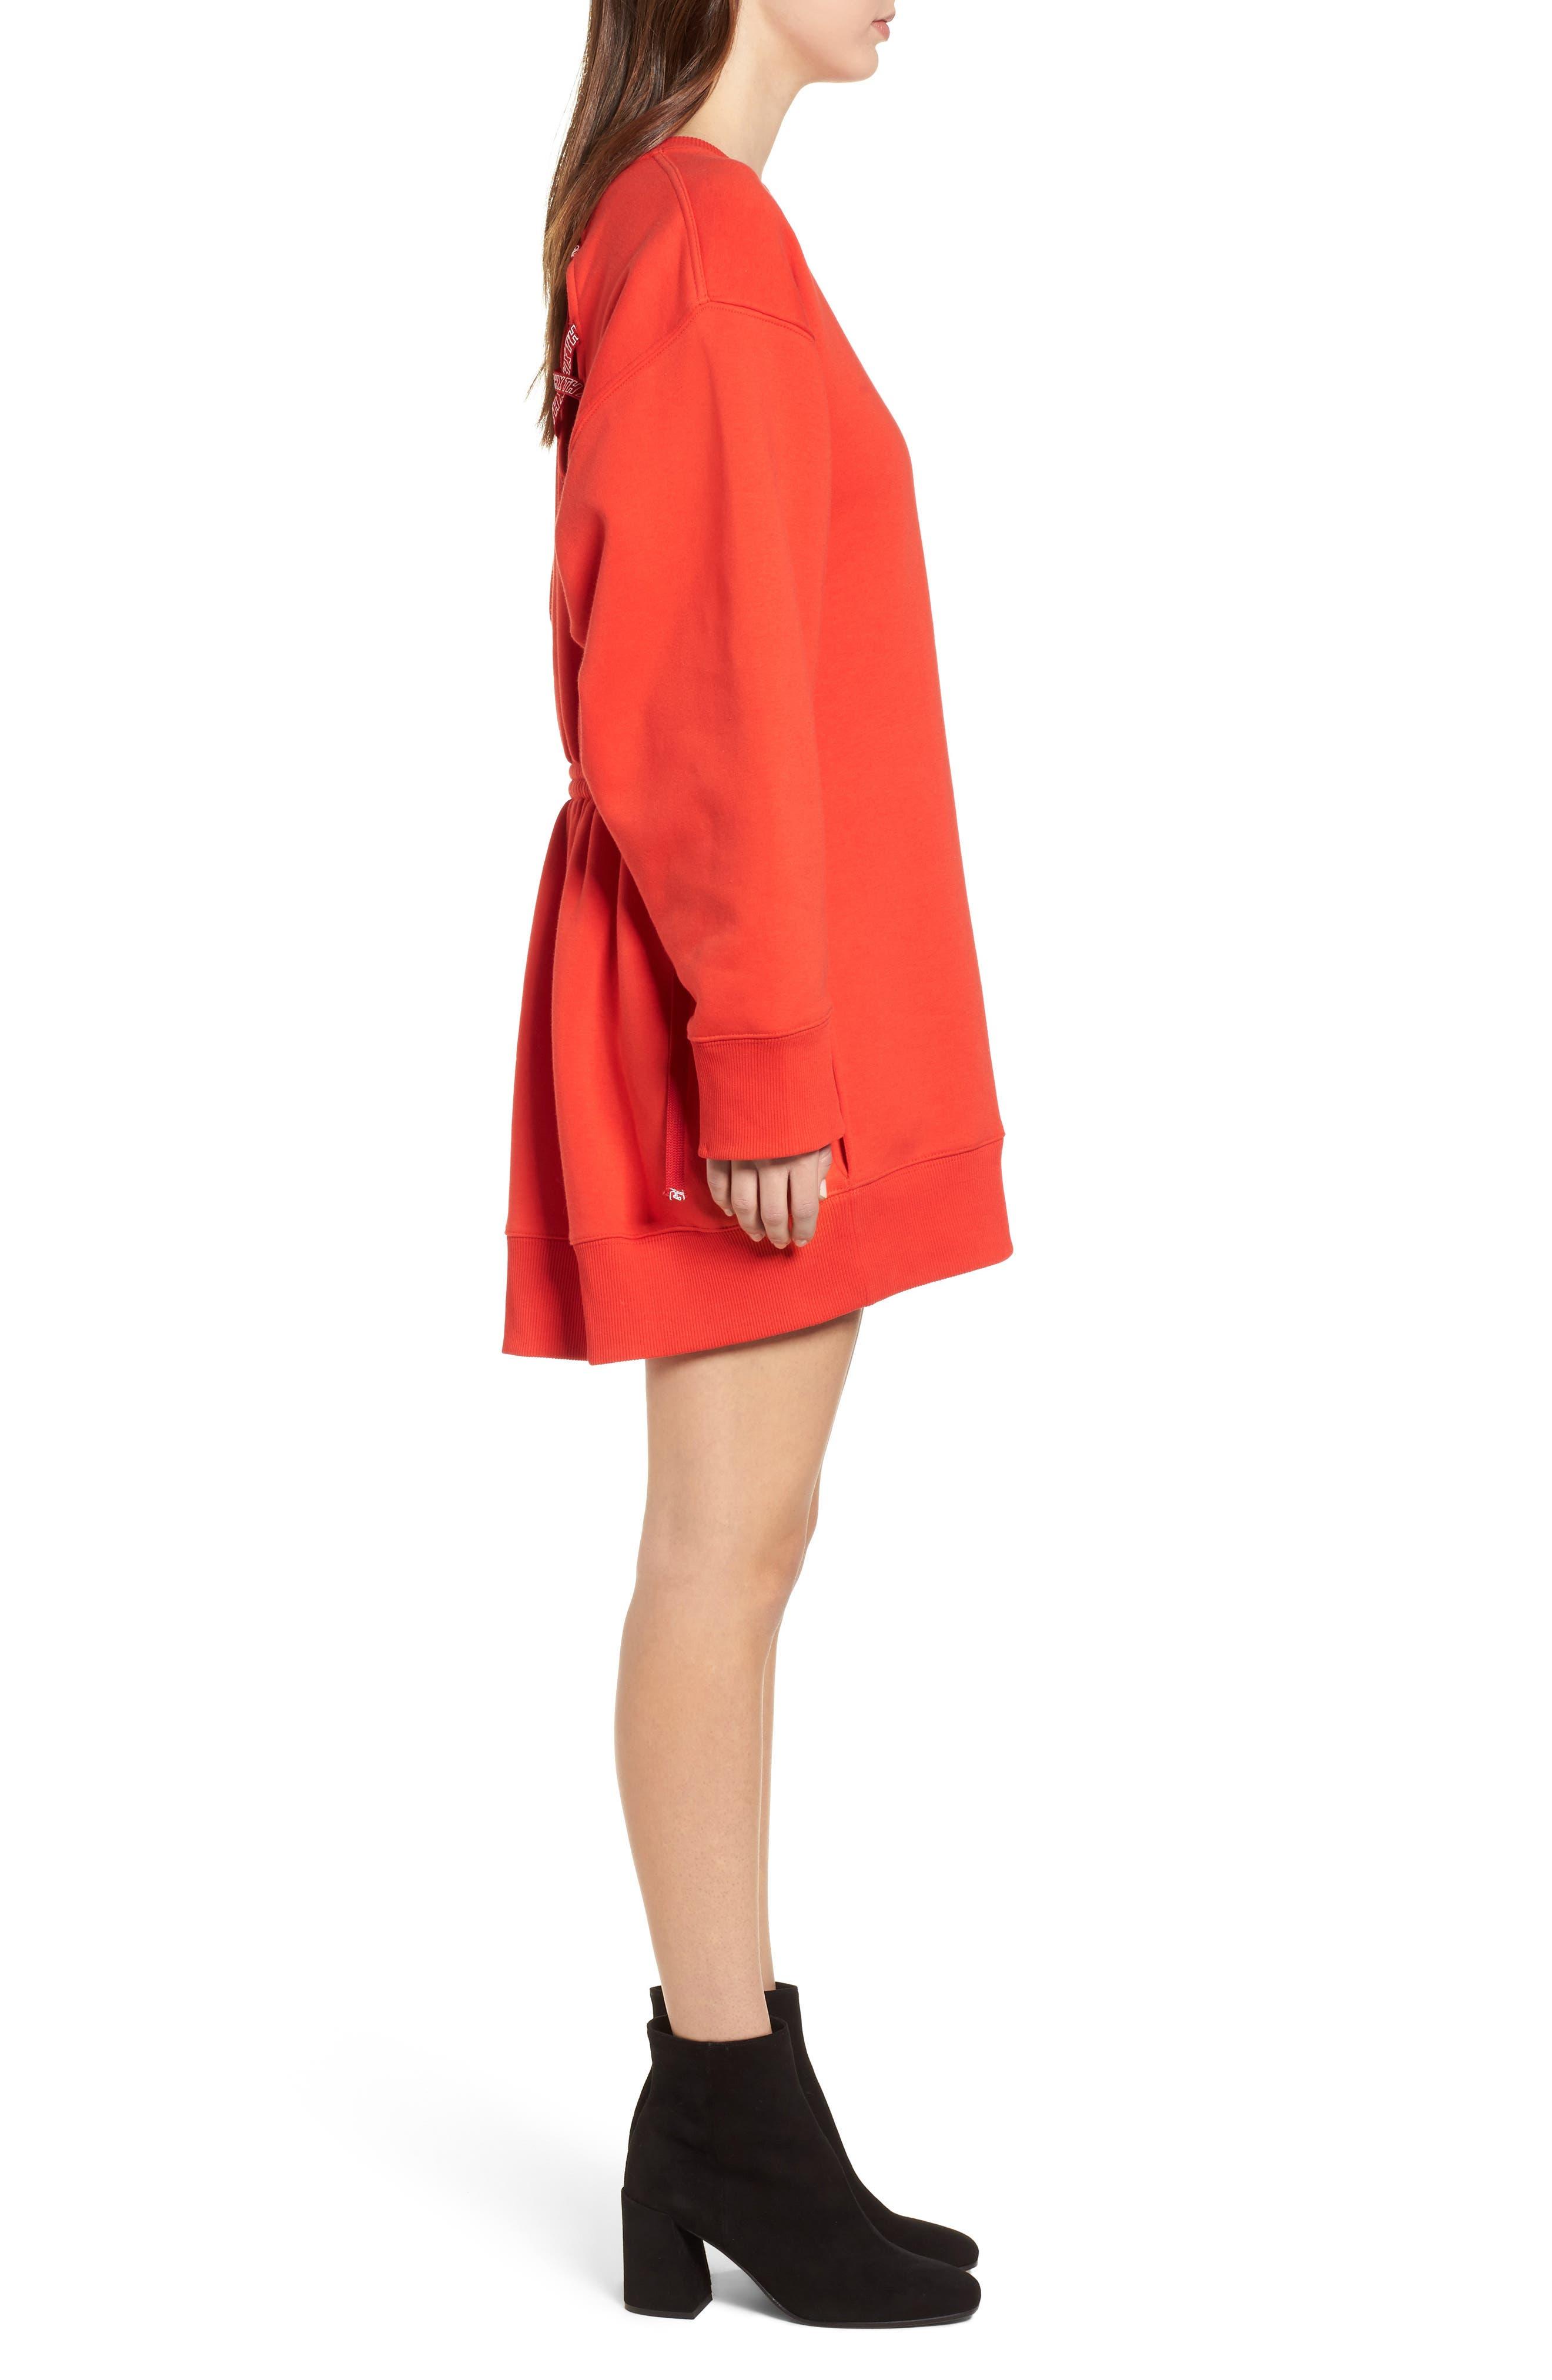 x Gigi Hadid Sweatshirt Dress,                             Alternate thumbnail 3, color,                             Flame Scarlet